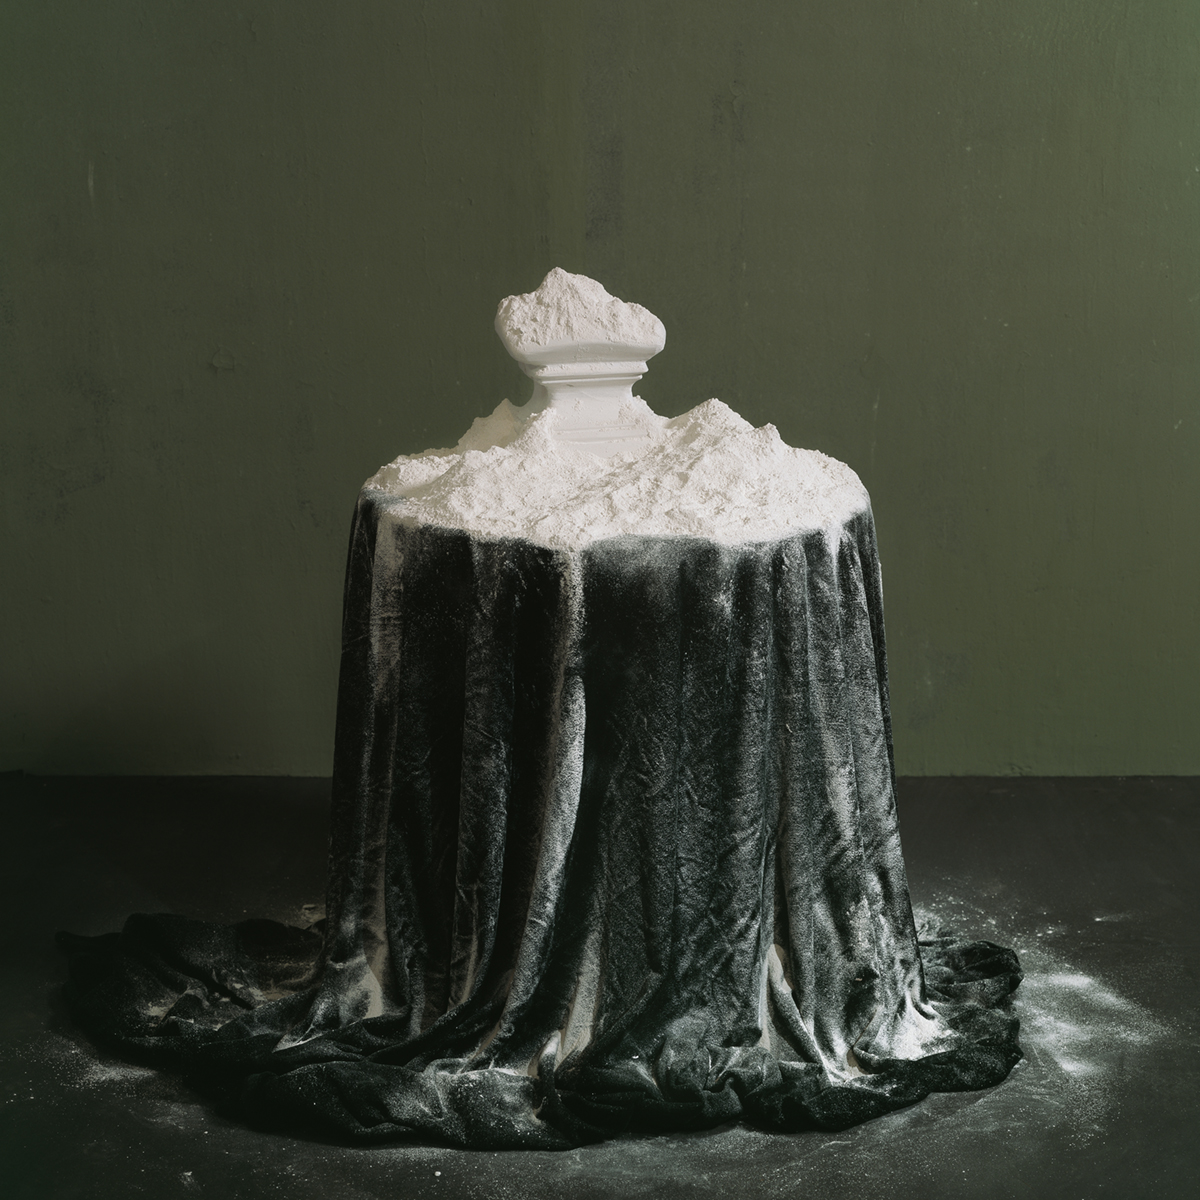 Chen Wei 陈维, Takes a Powder Every Morning, 2011, Archival inkjet print 收藏级艺术微喷, 100 x 100 cm